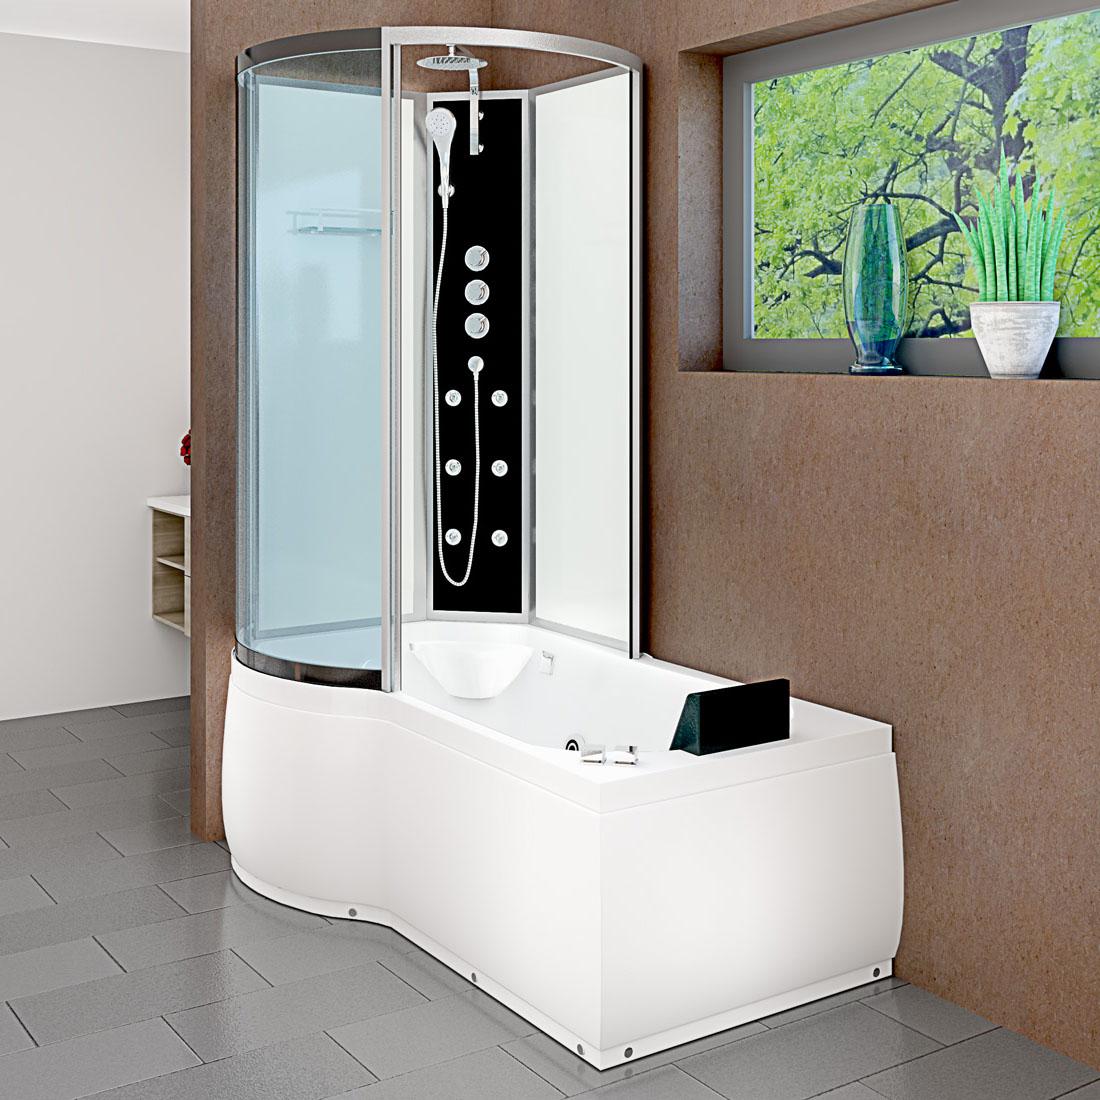 acquavapore dtp8050 a006r dusch wannen kombi in 98x170cm trendbad24. Black Bedroom Furniture Sets. Home Design Ideas